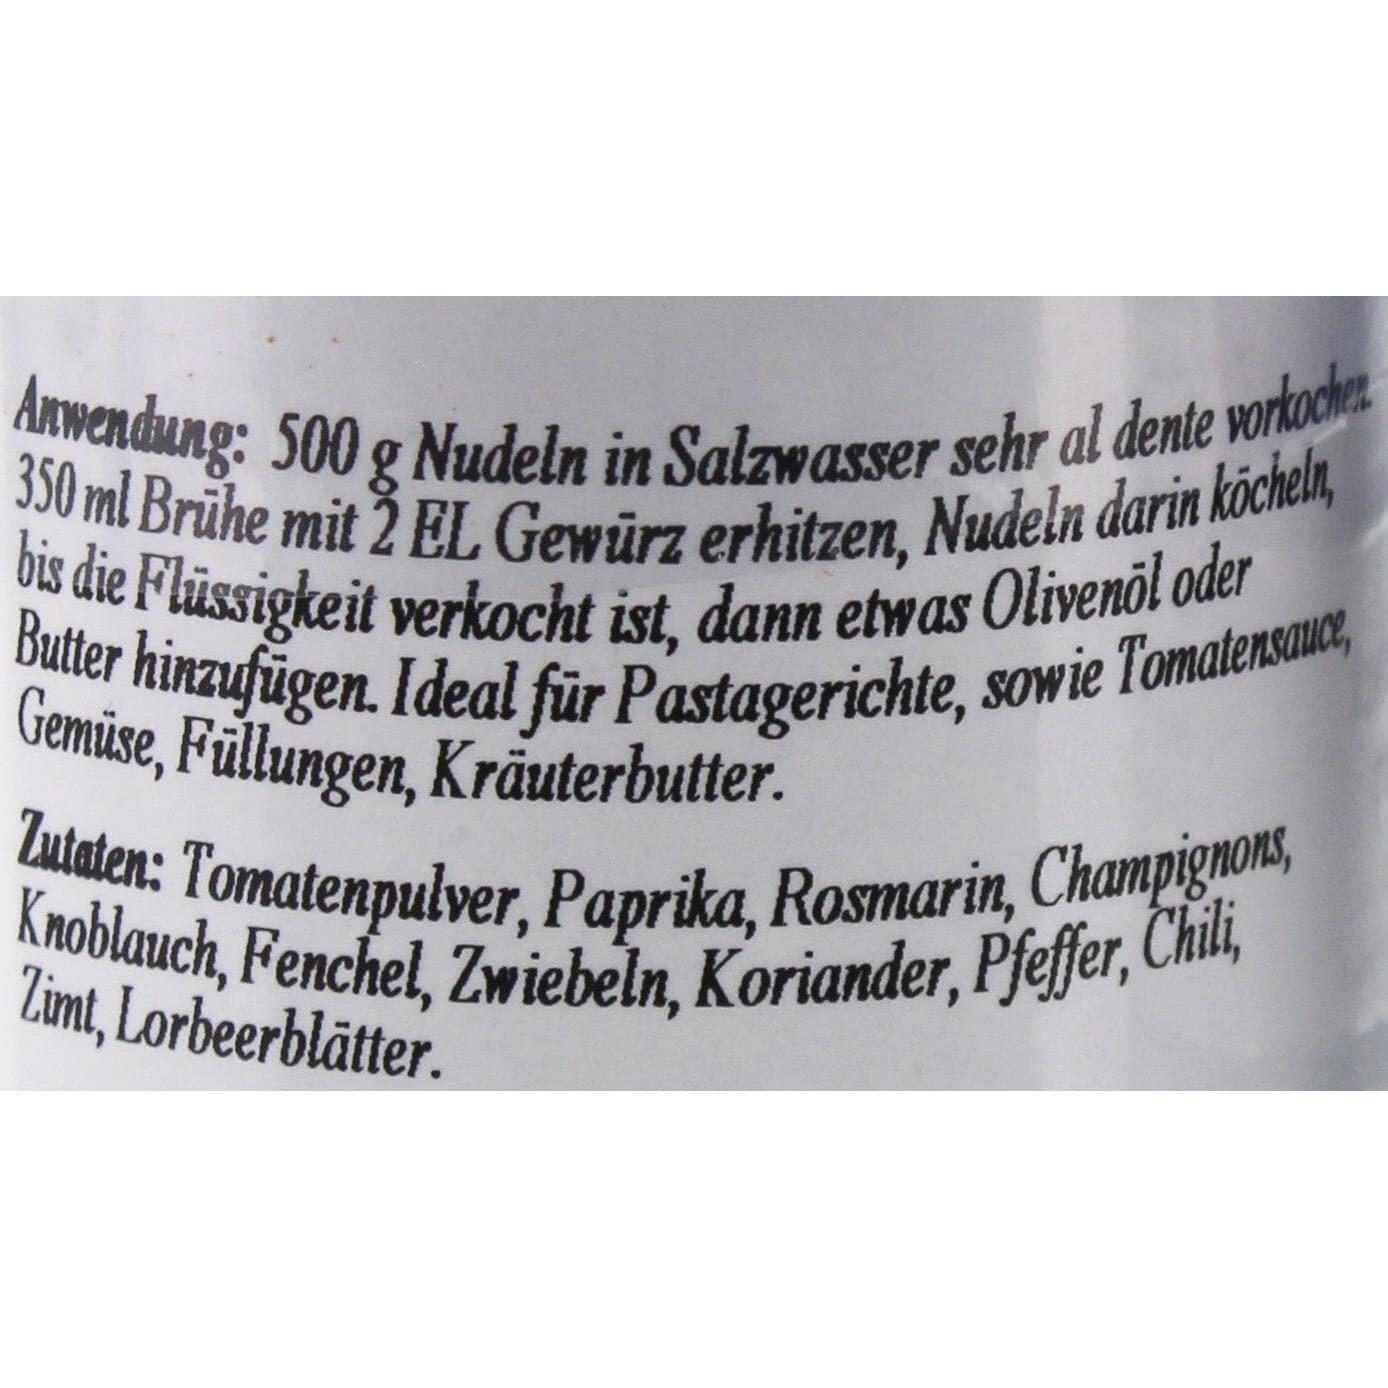 Schuhbecks - Gewürzmischung Toskanisches Nudelgewürz - 50g